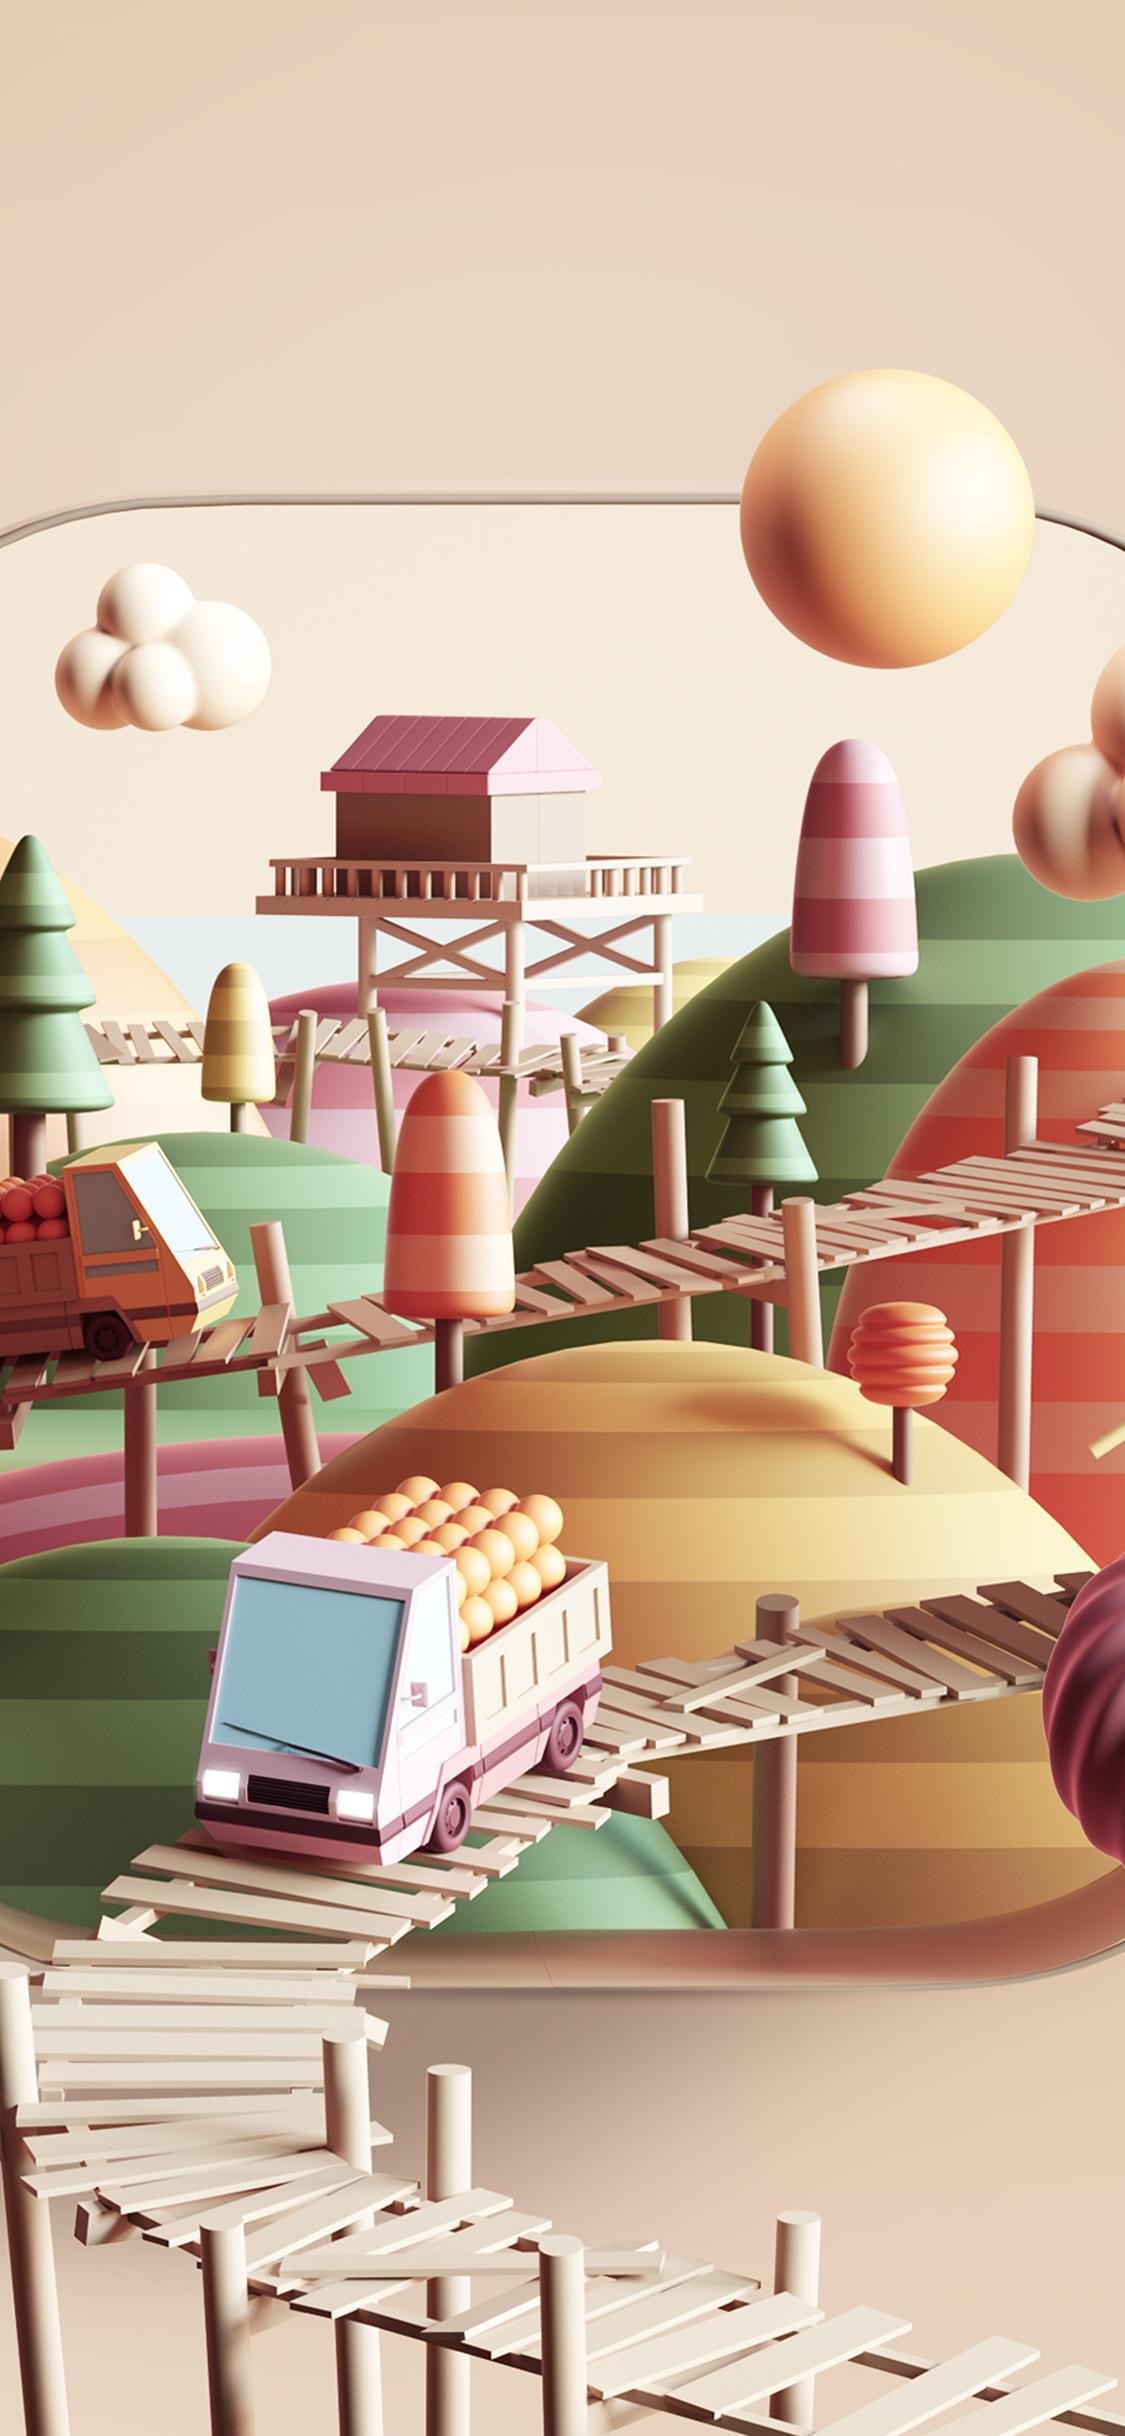 iPhonexpapers.com-Apple-iPhone-wallpaper-bk27-art-illust-3d-cute